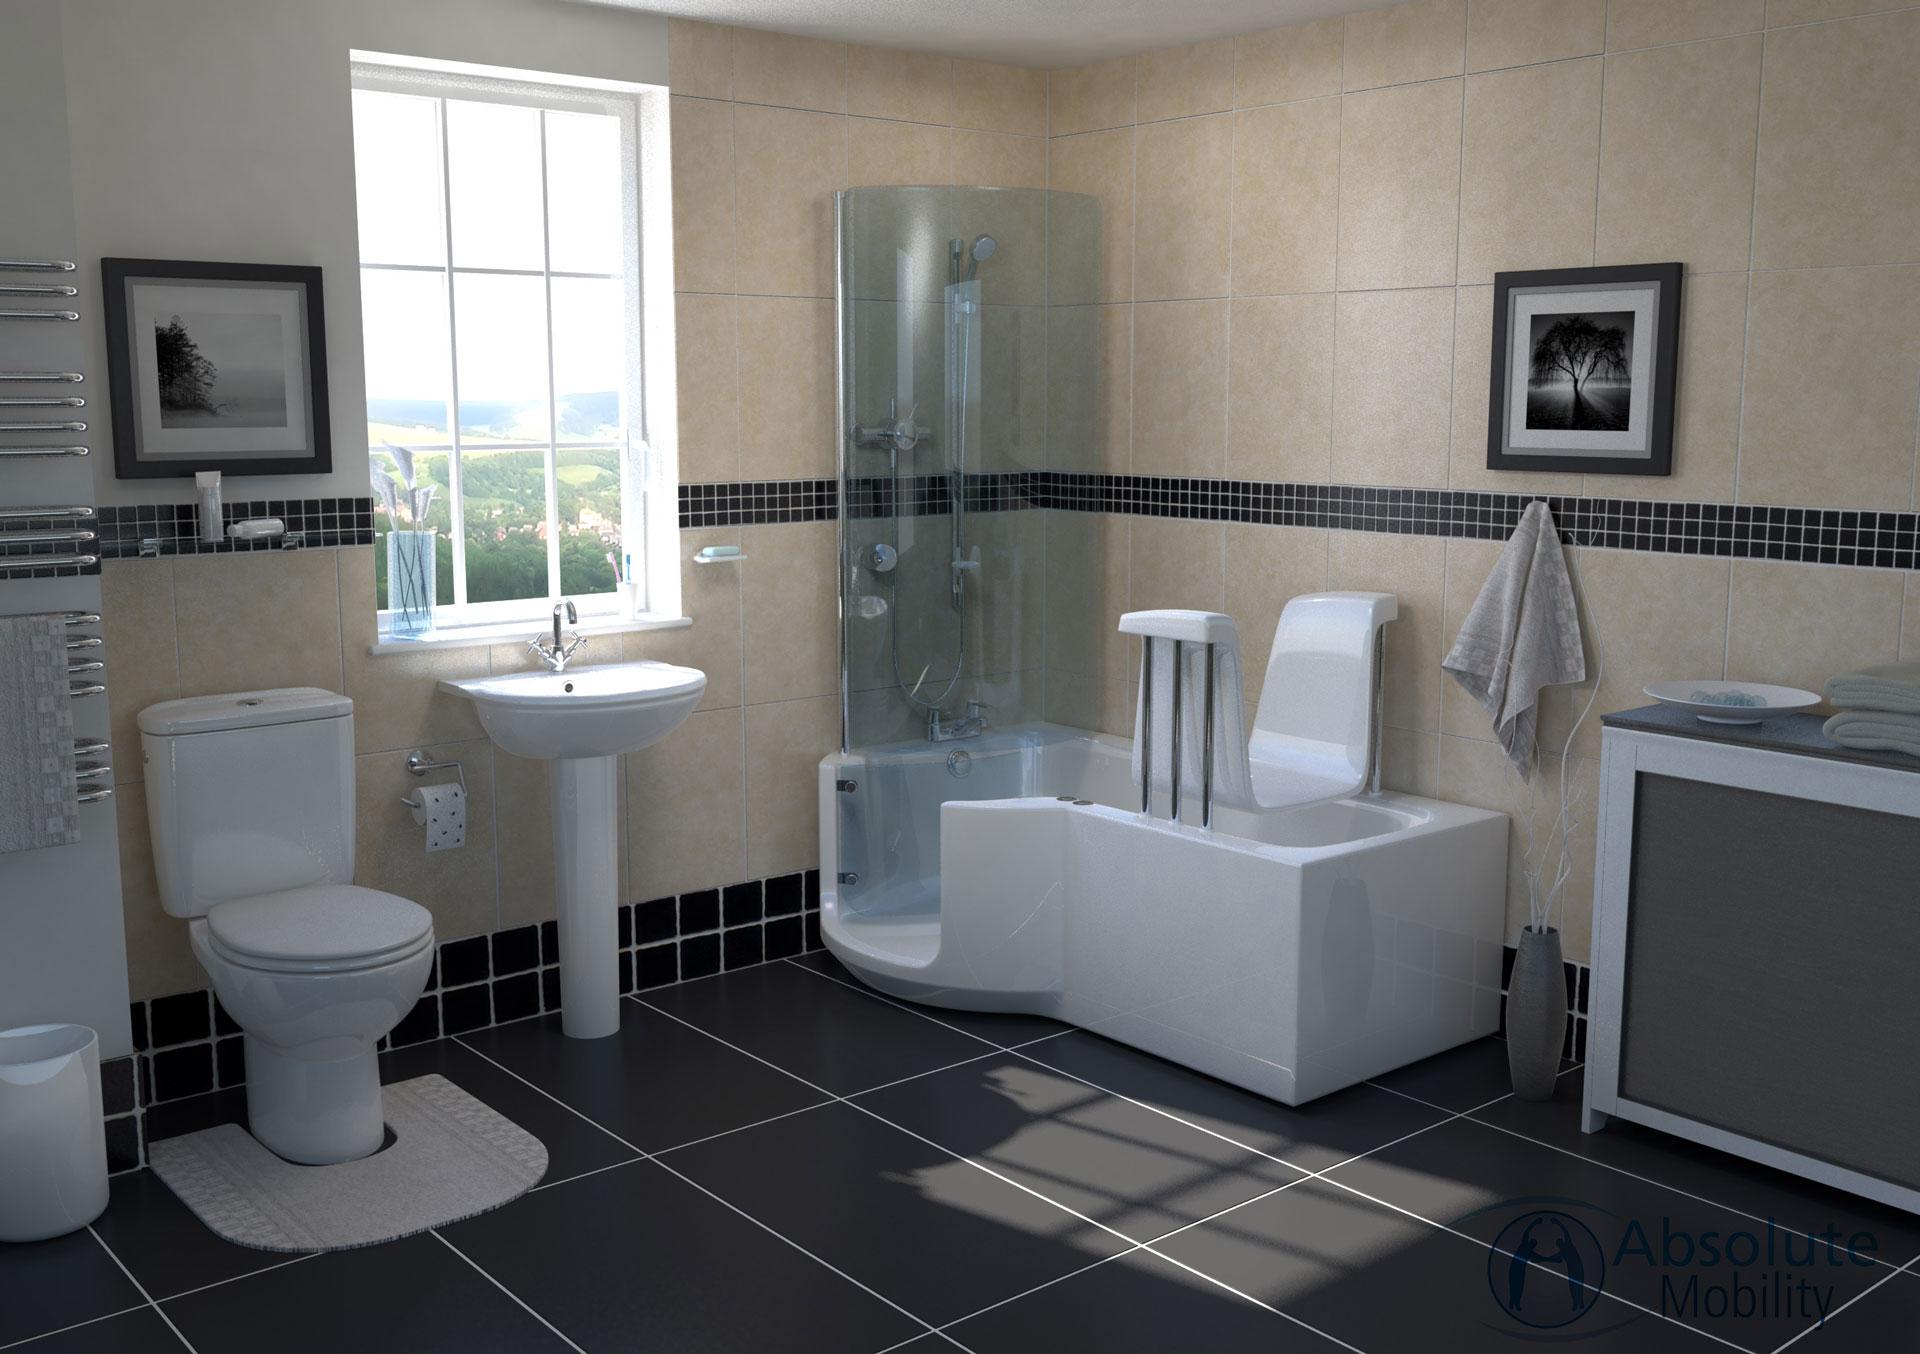 CGI bathroom interior rendering image